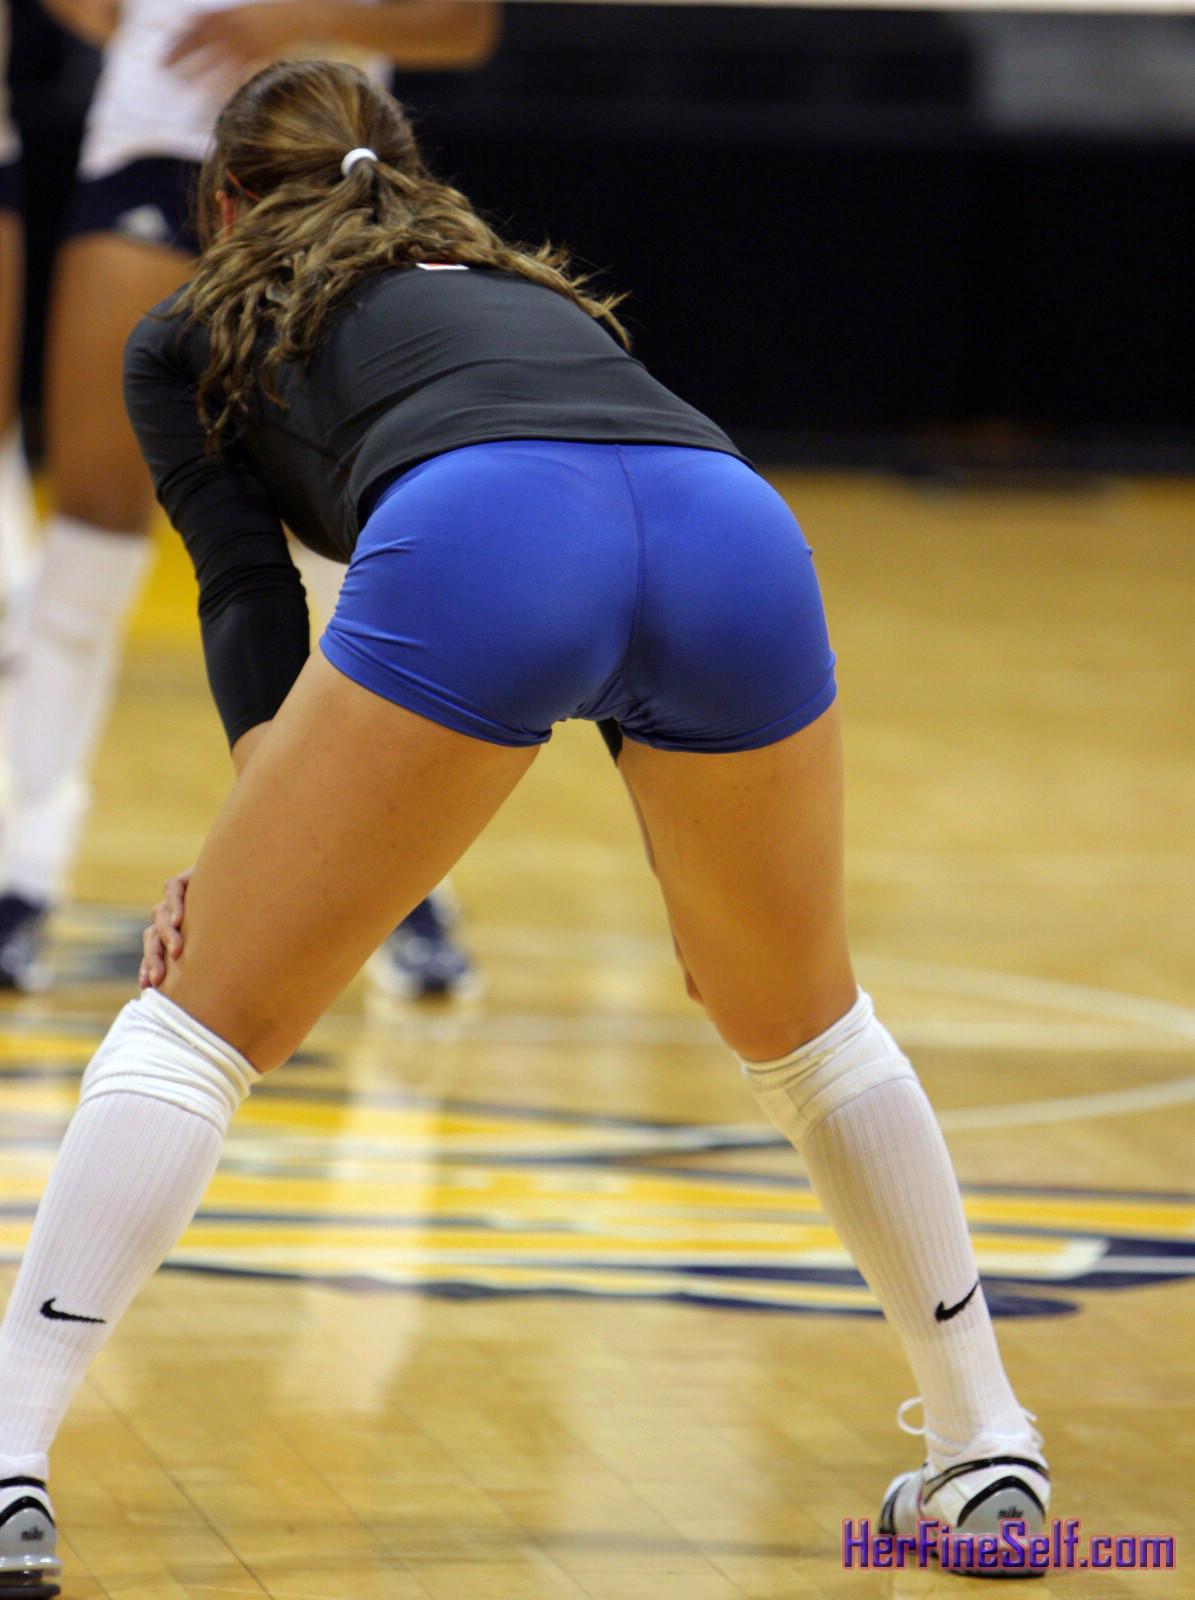 Olympussy Mostly Volley - Candid Teens